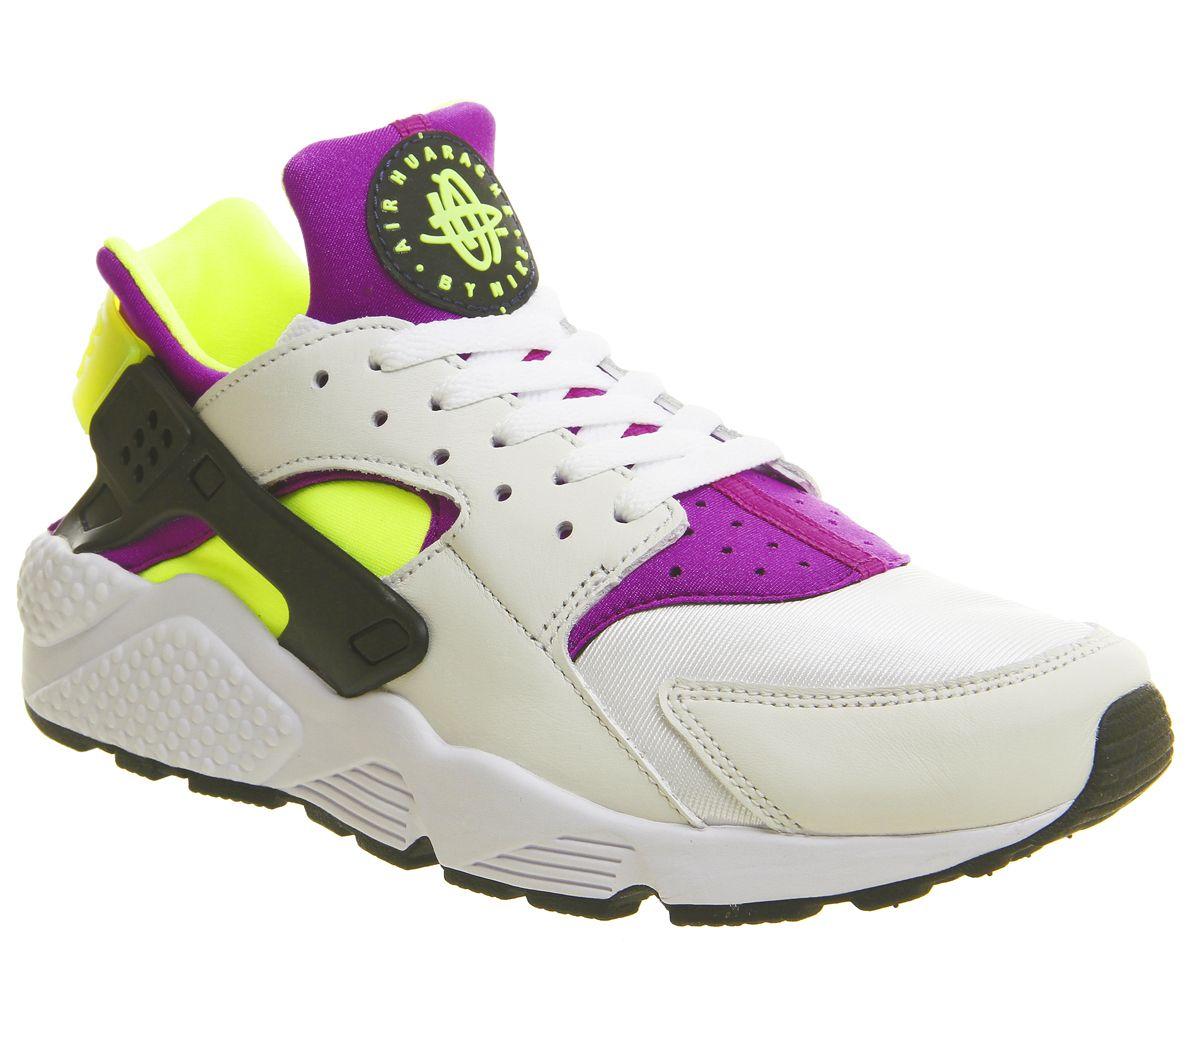 c52da3023c80c Nike Air Huarache Trainers White Black Neon Yellow Qs - His trainers